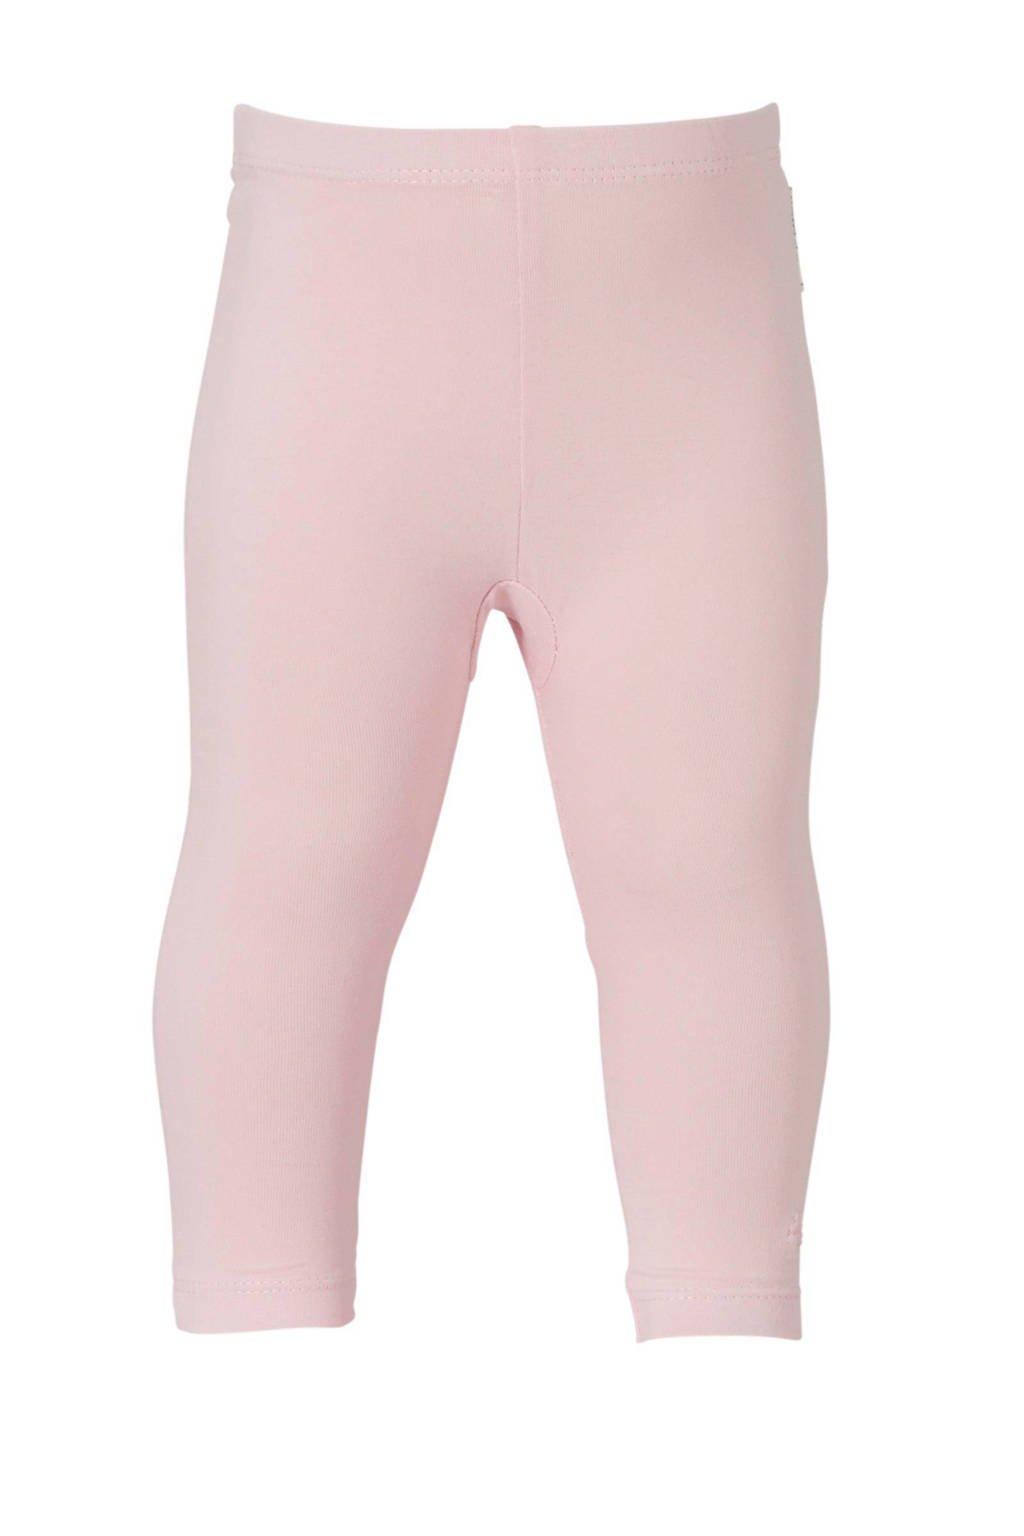 Noppies baby legging roze, Roze